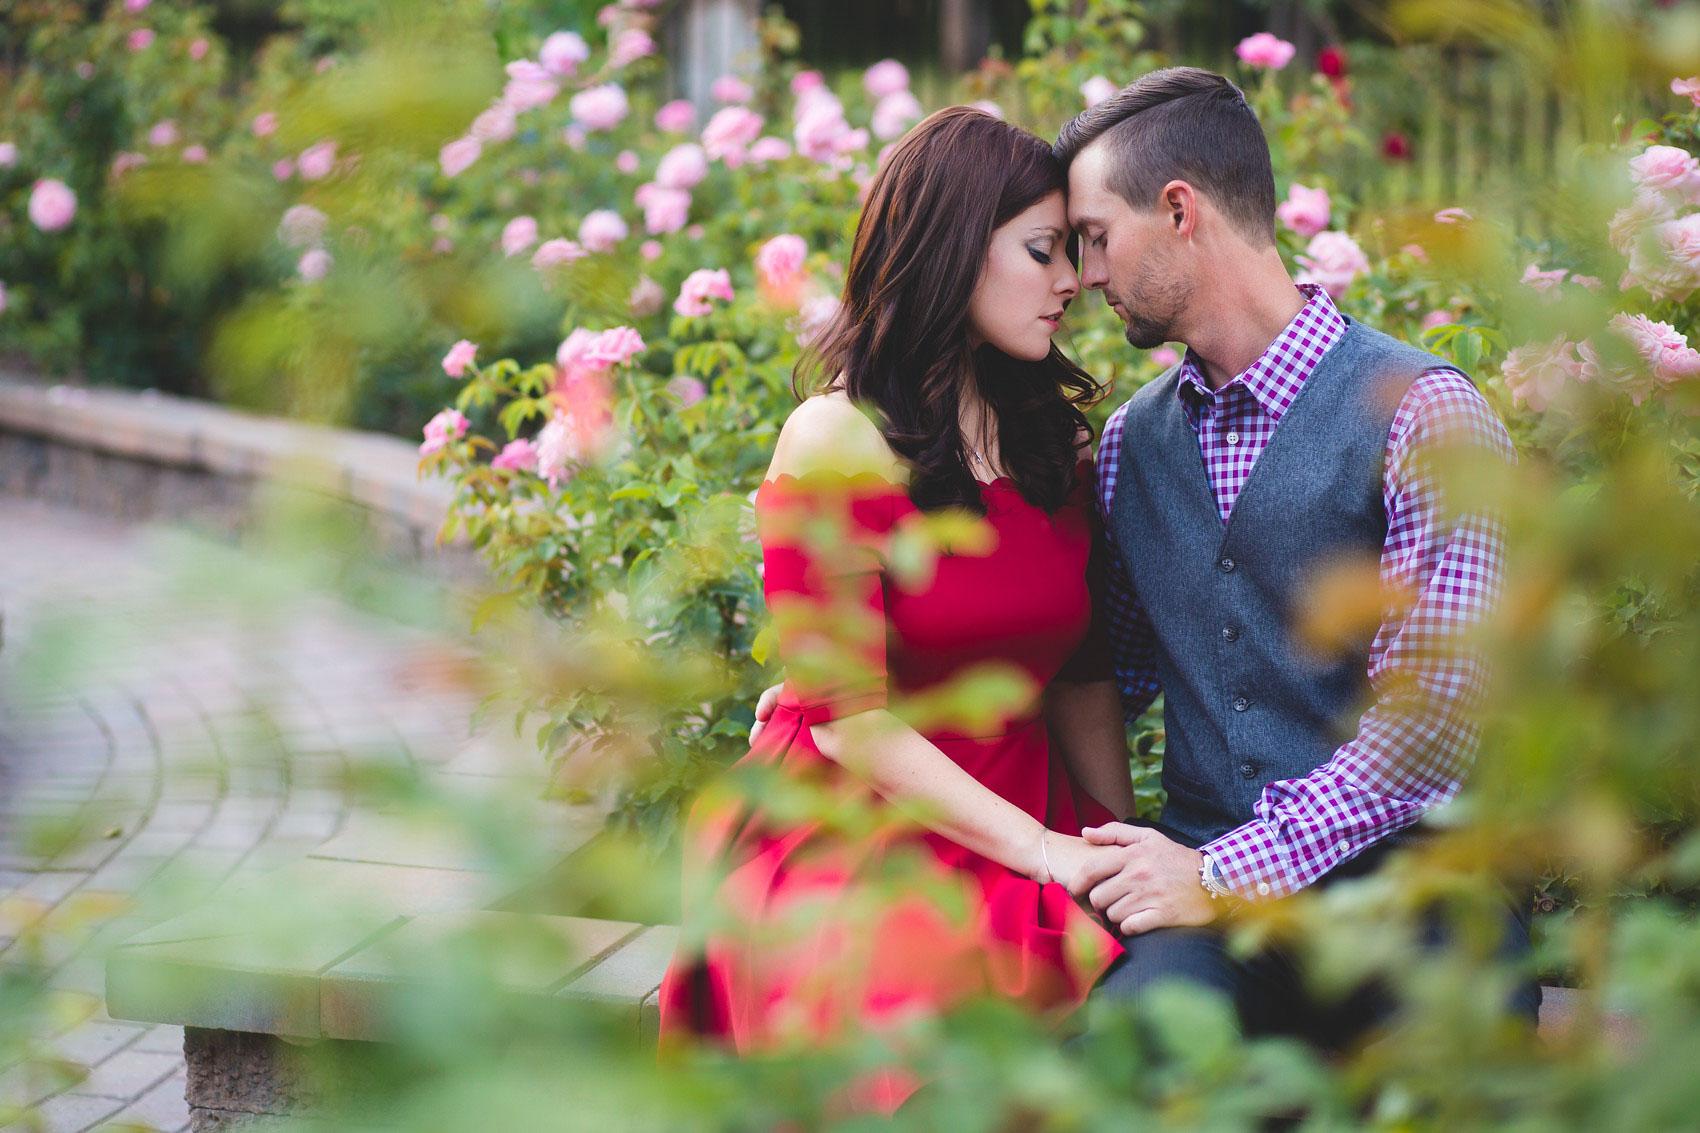 adam-szarmack-jacksonville-wedding-photographer-washington-oaks-gardens-state-park-engagement-24.jpg